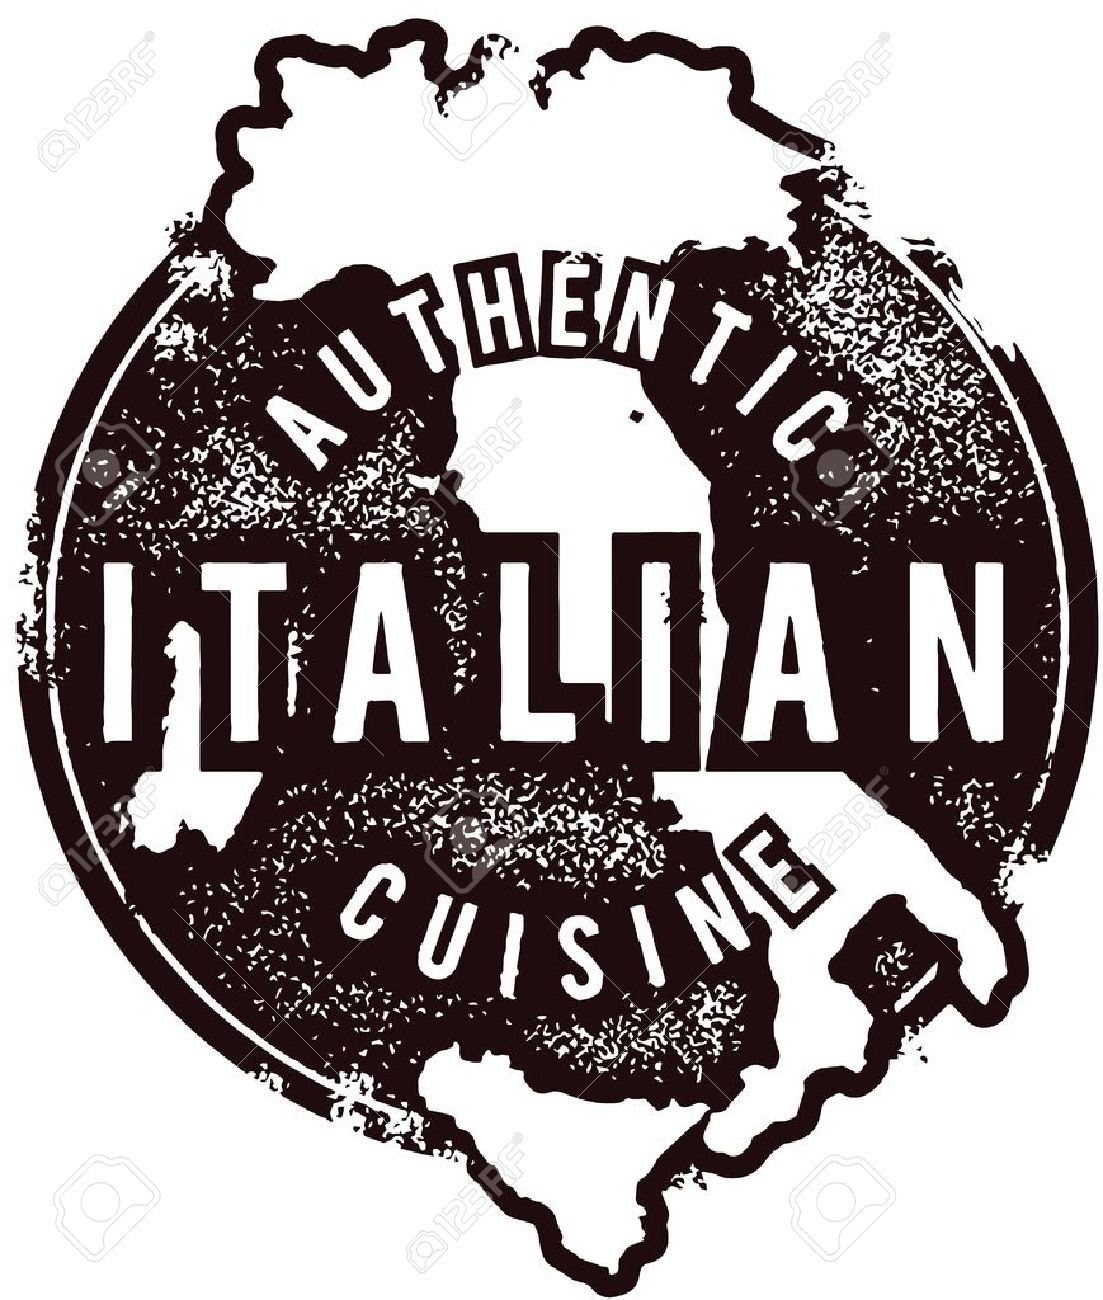 Authentic Italian Restaurant Menu Stmap.